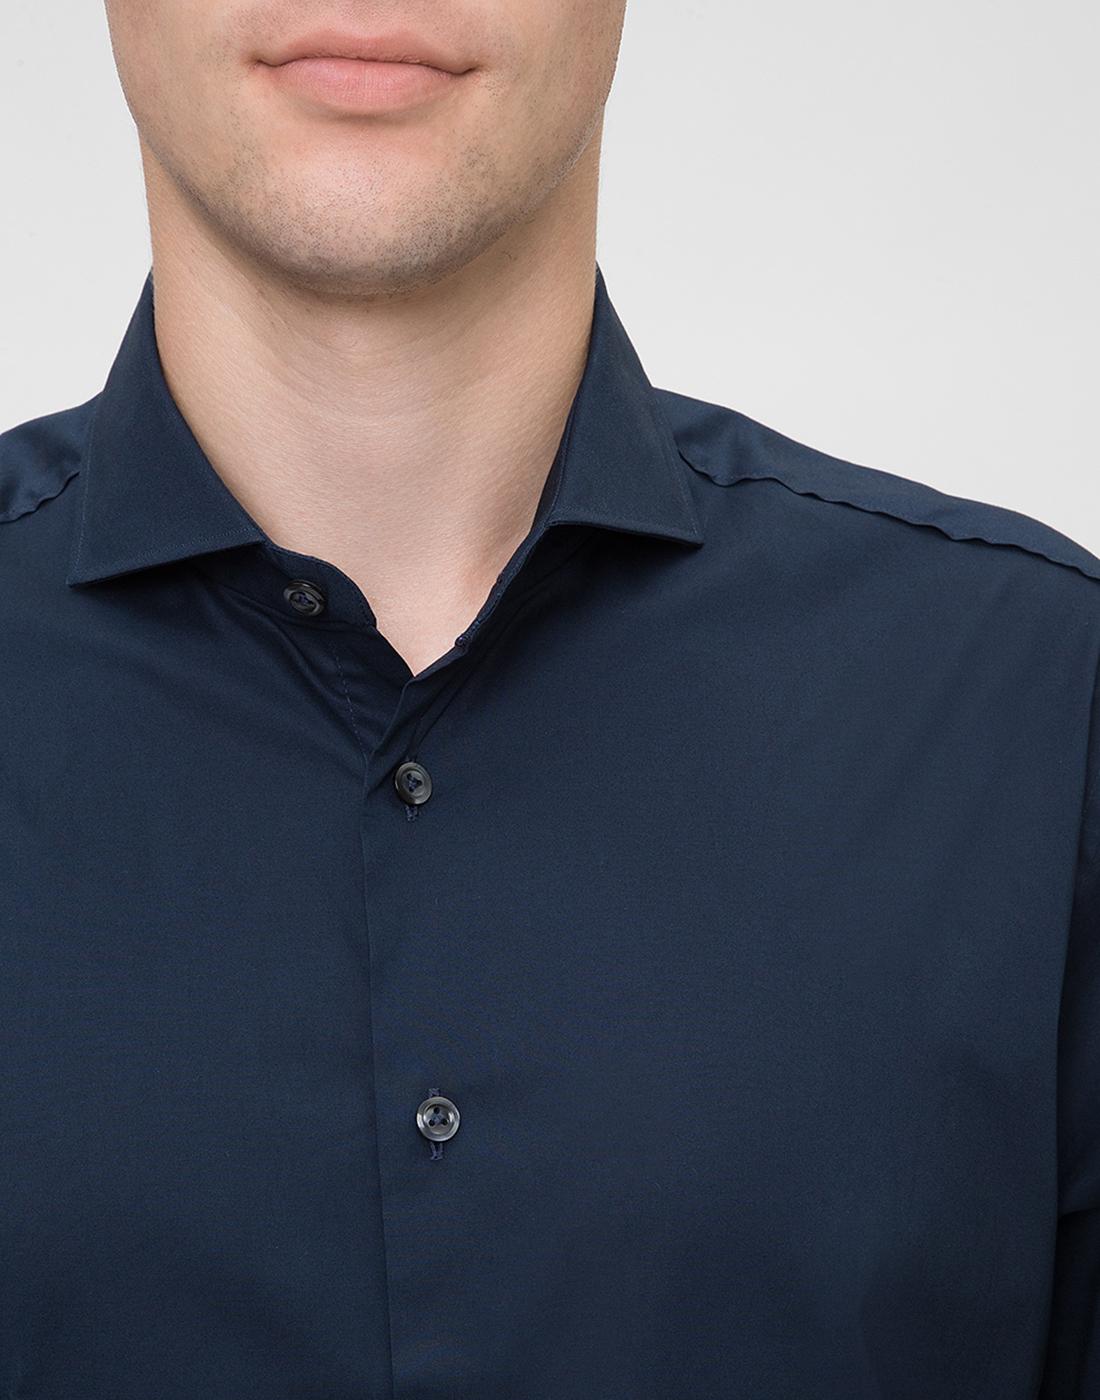 Мужская темно-синяя рубашка Van Laack S130050/790-6